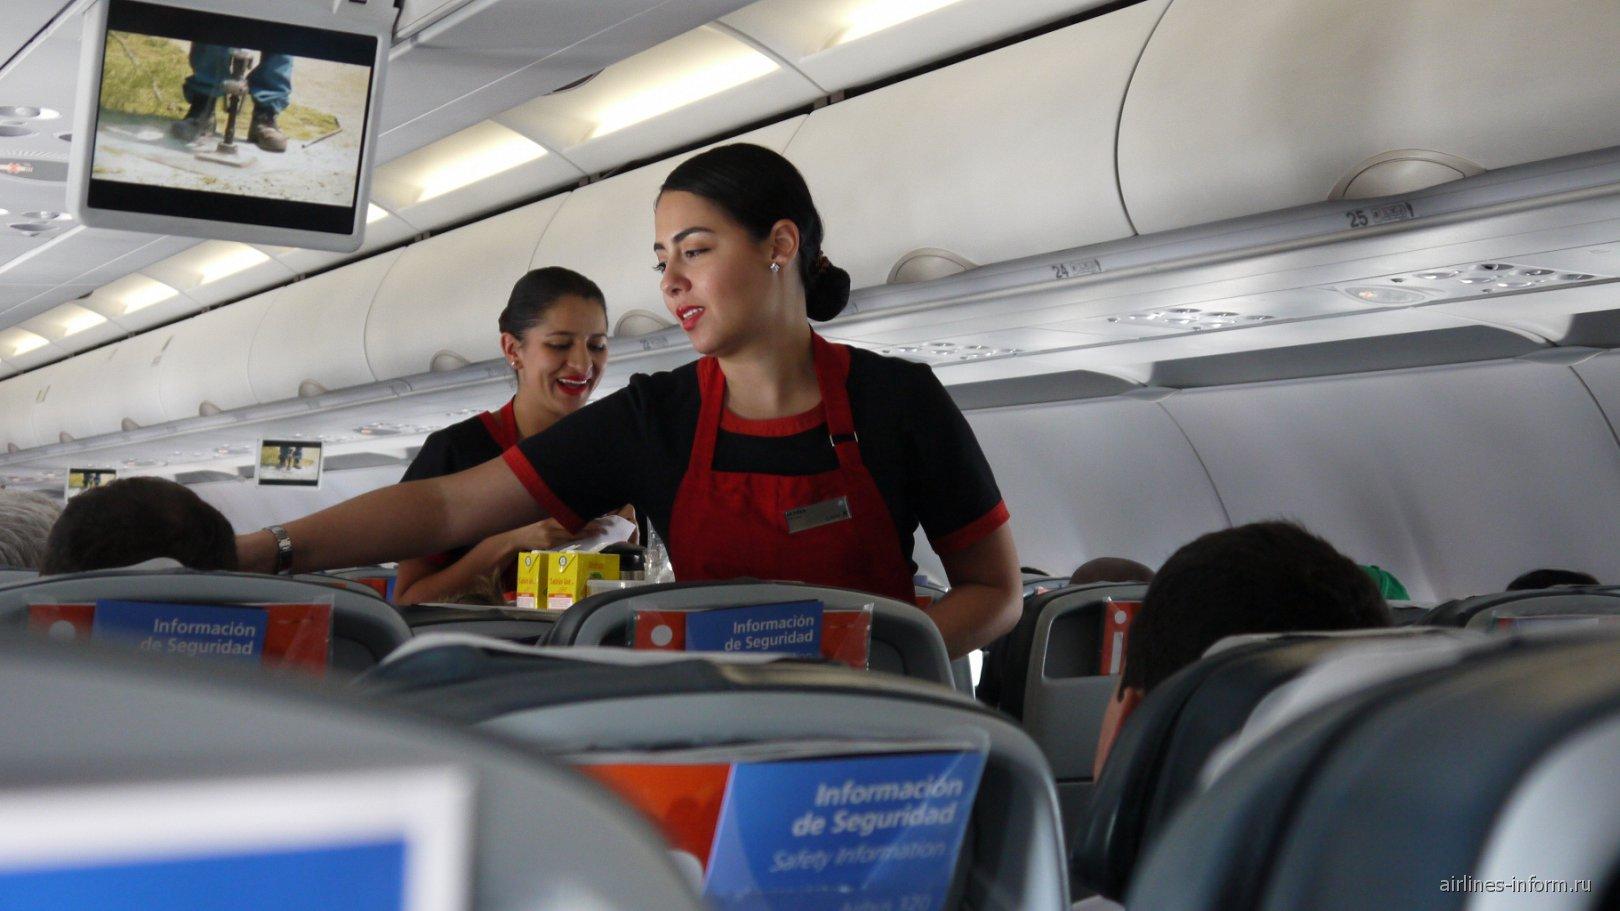 Бортпроводницы авиакомпании LAN Colombia